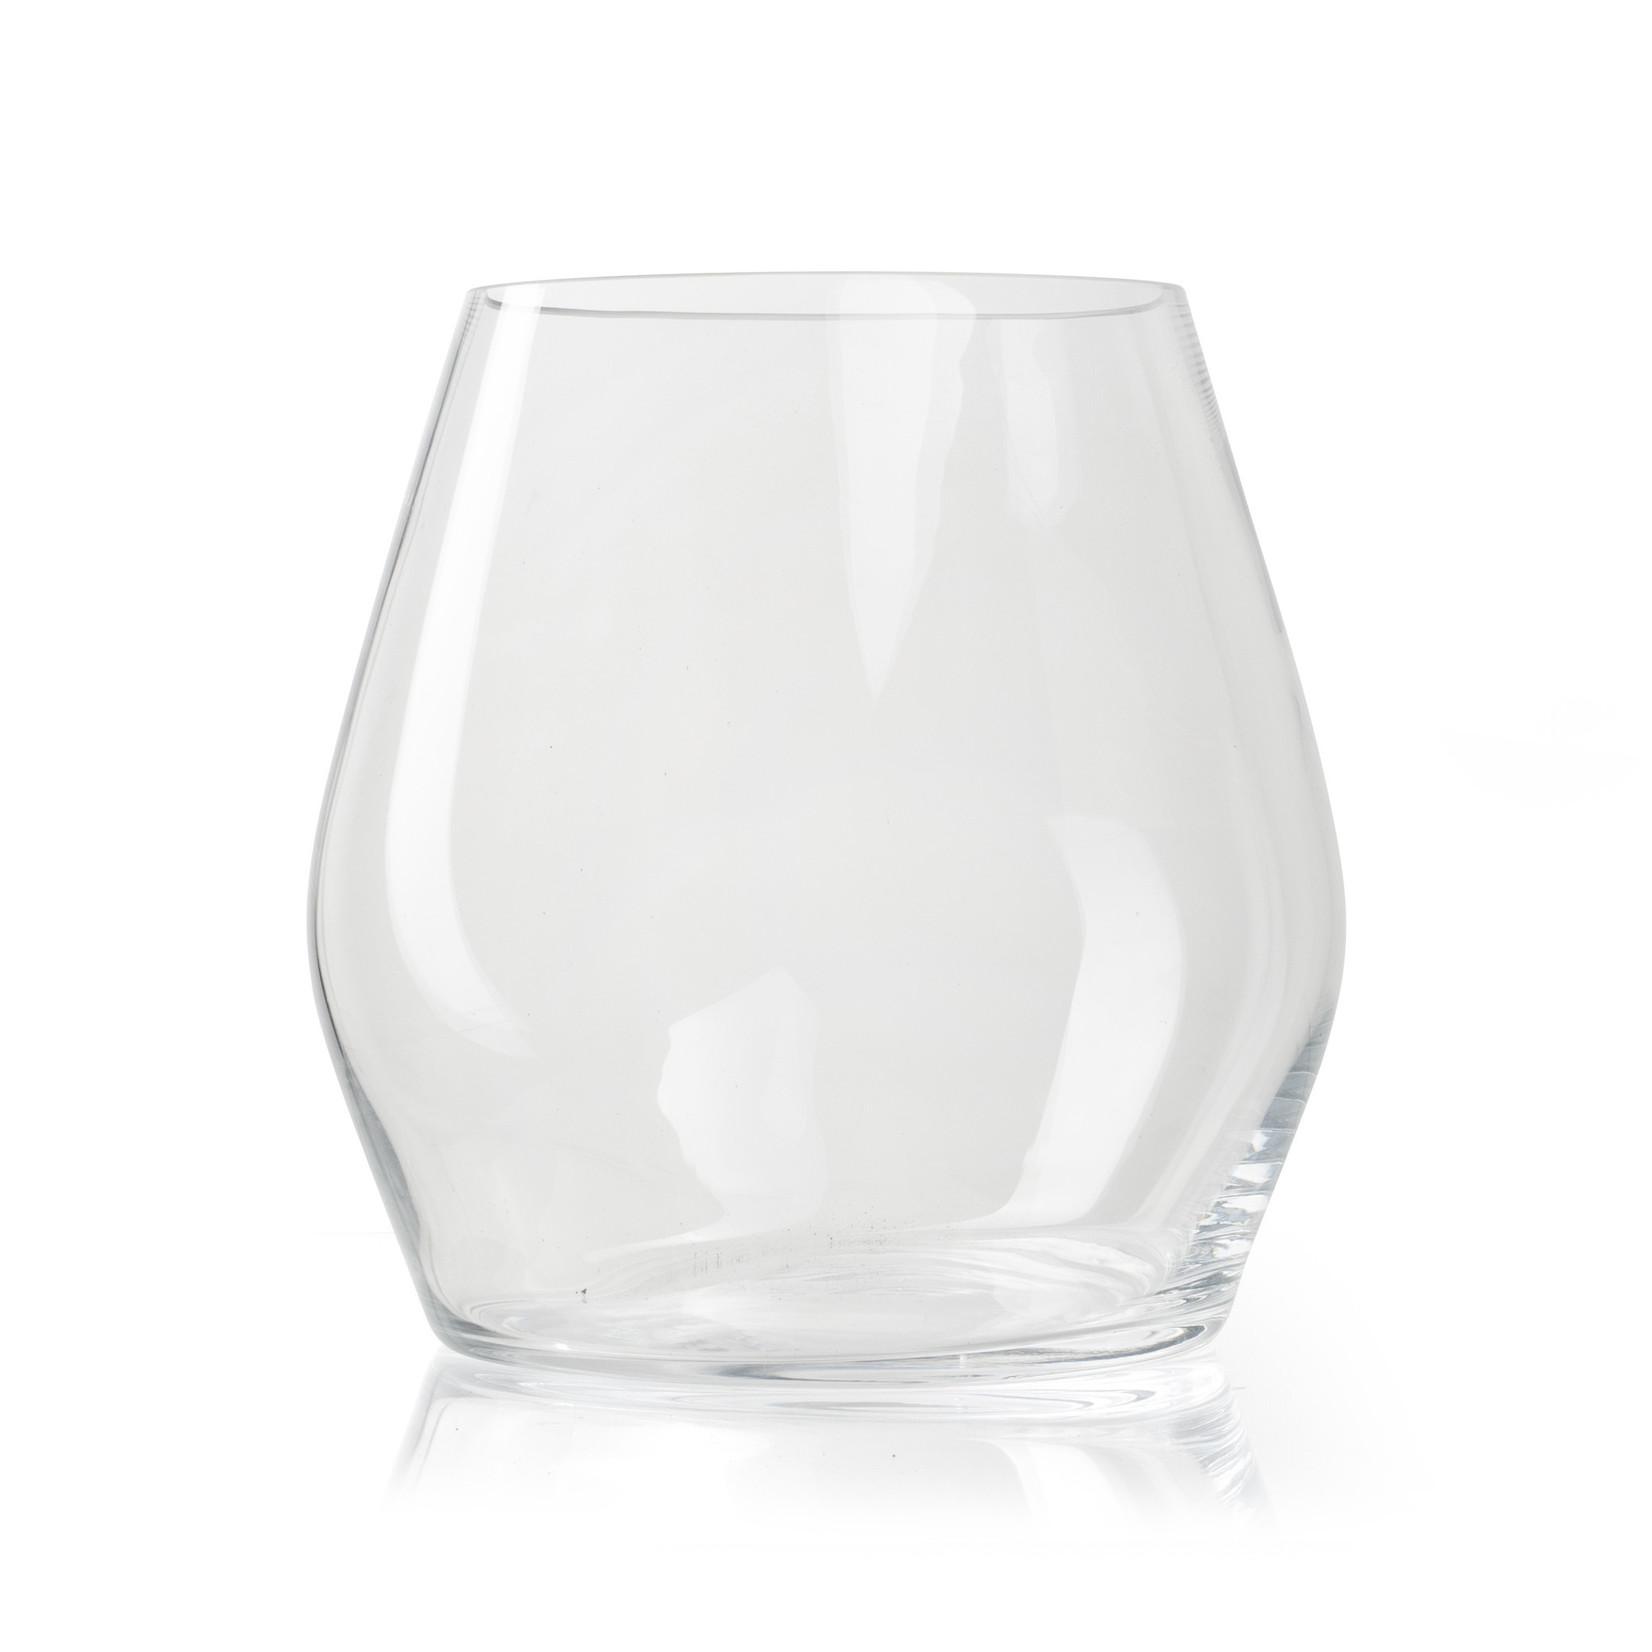 Jodeco Glass Glazen vaas 'George' H25 D25 cm Transparant